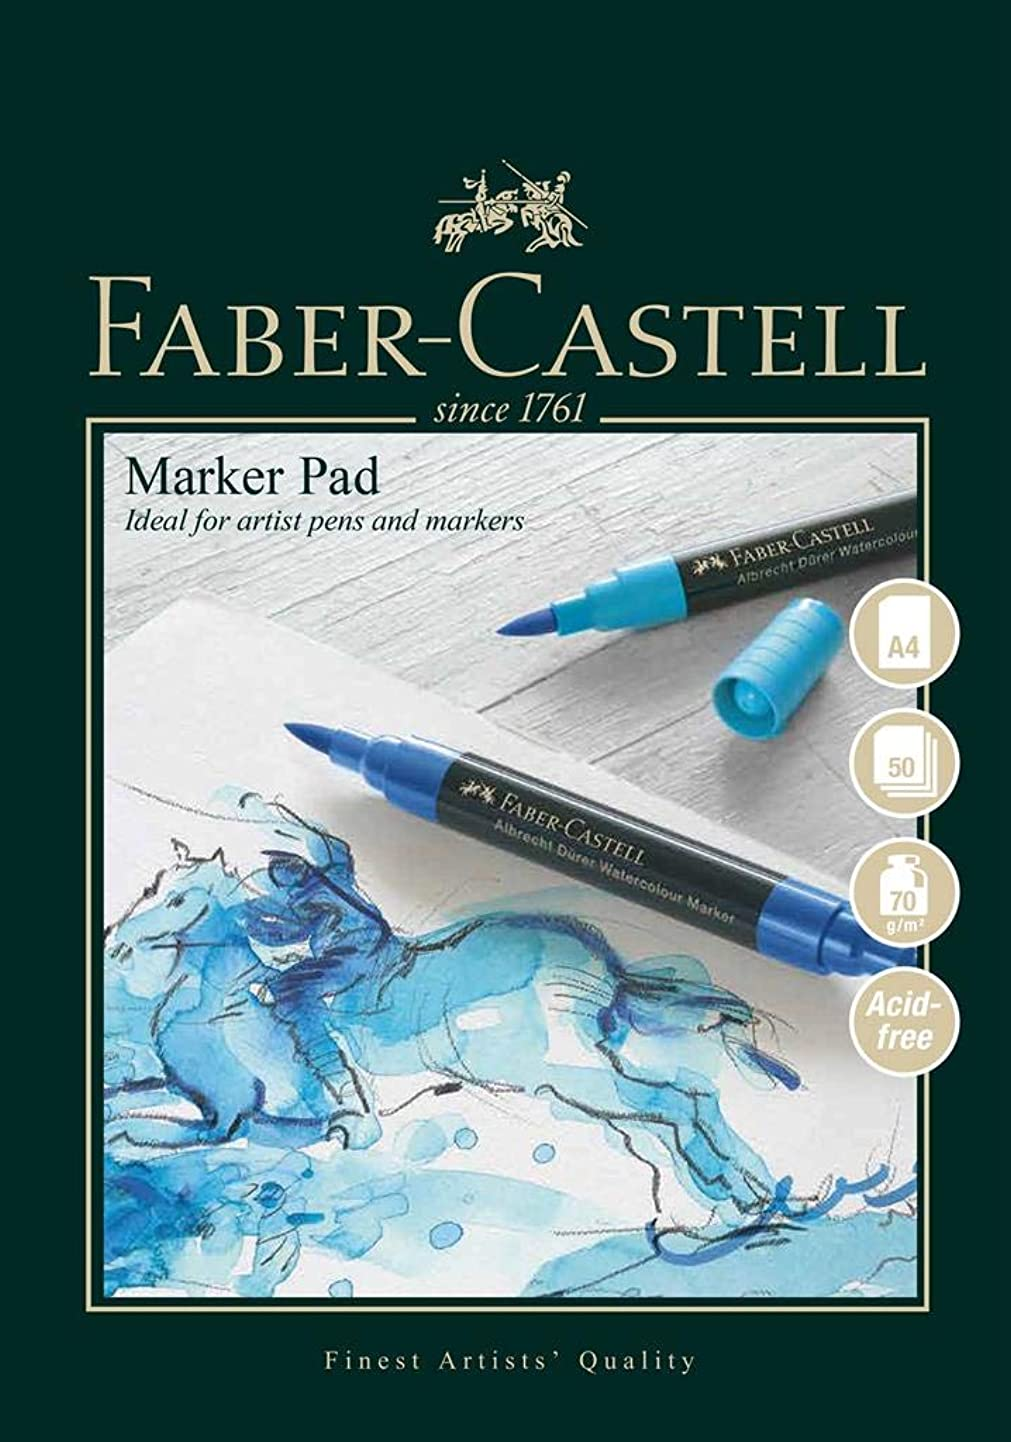 Faber-Castell A4 Gummed Marker Pad - 70gsm - 50 Sheets lgxgwattxwn4